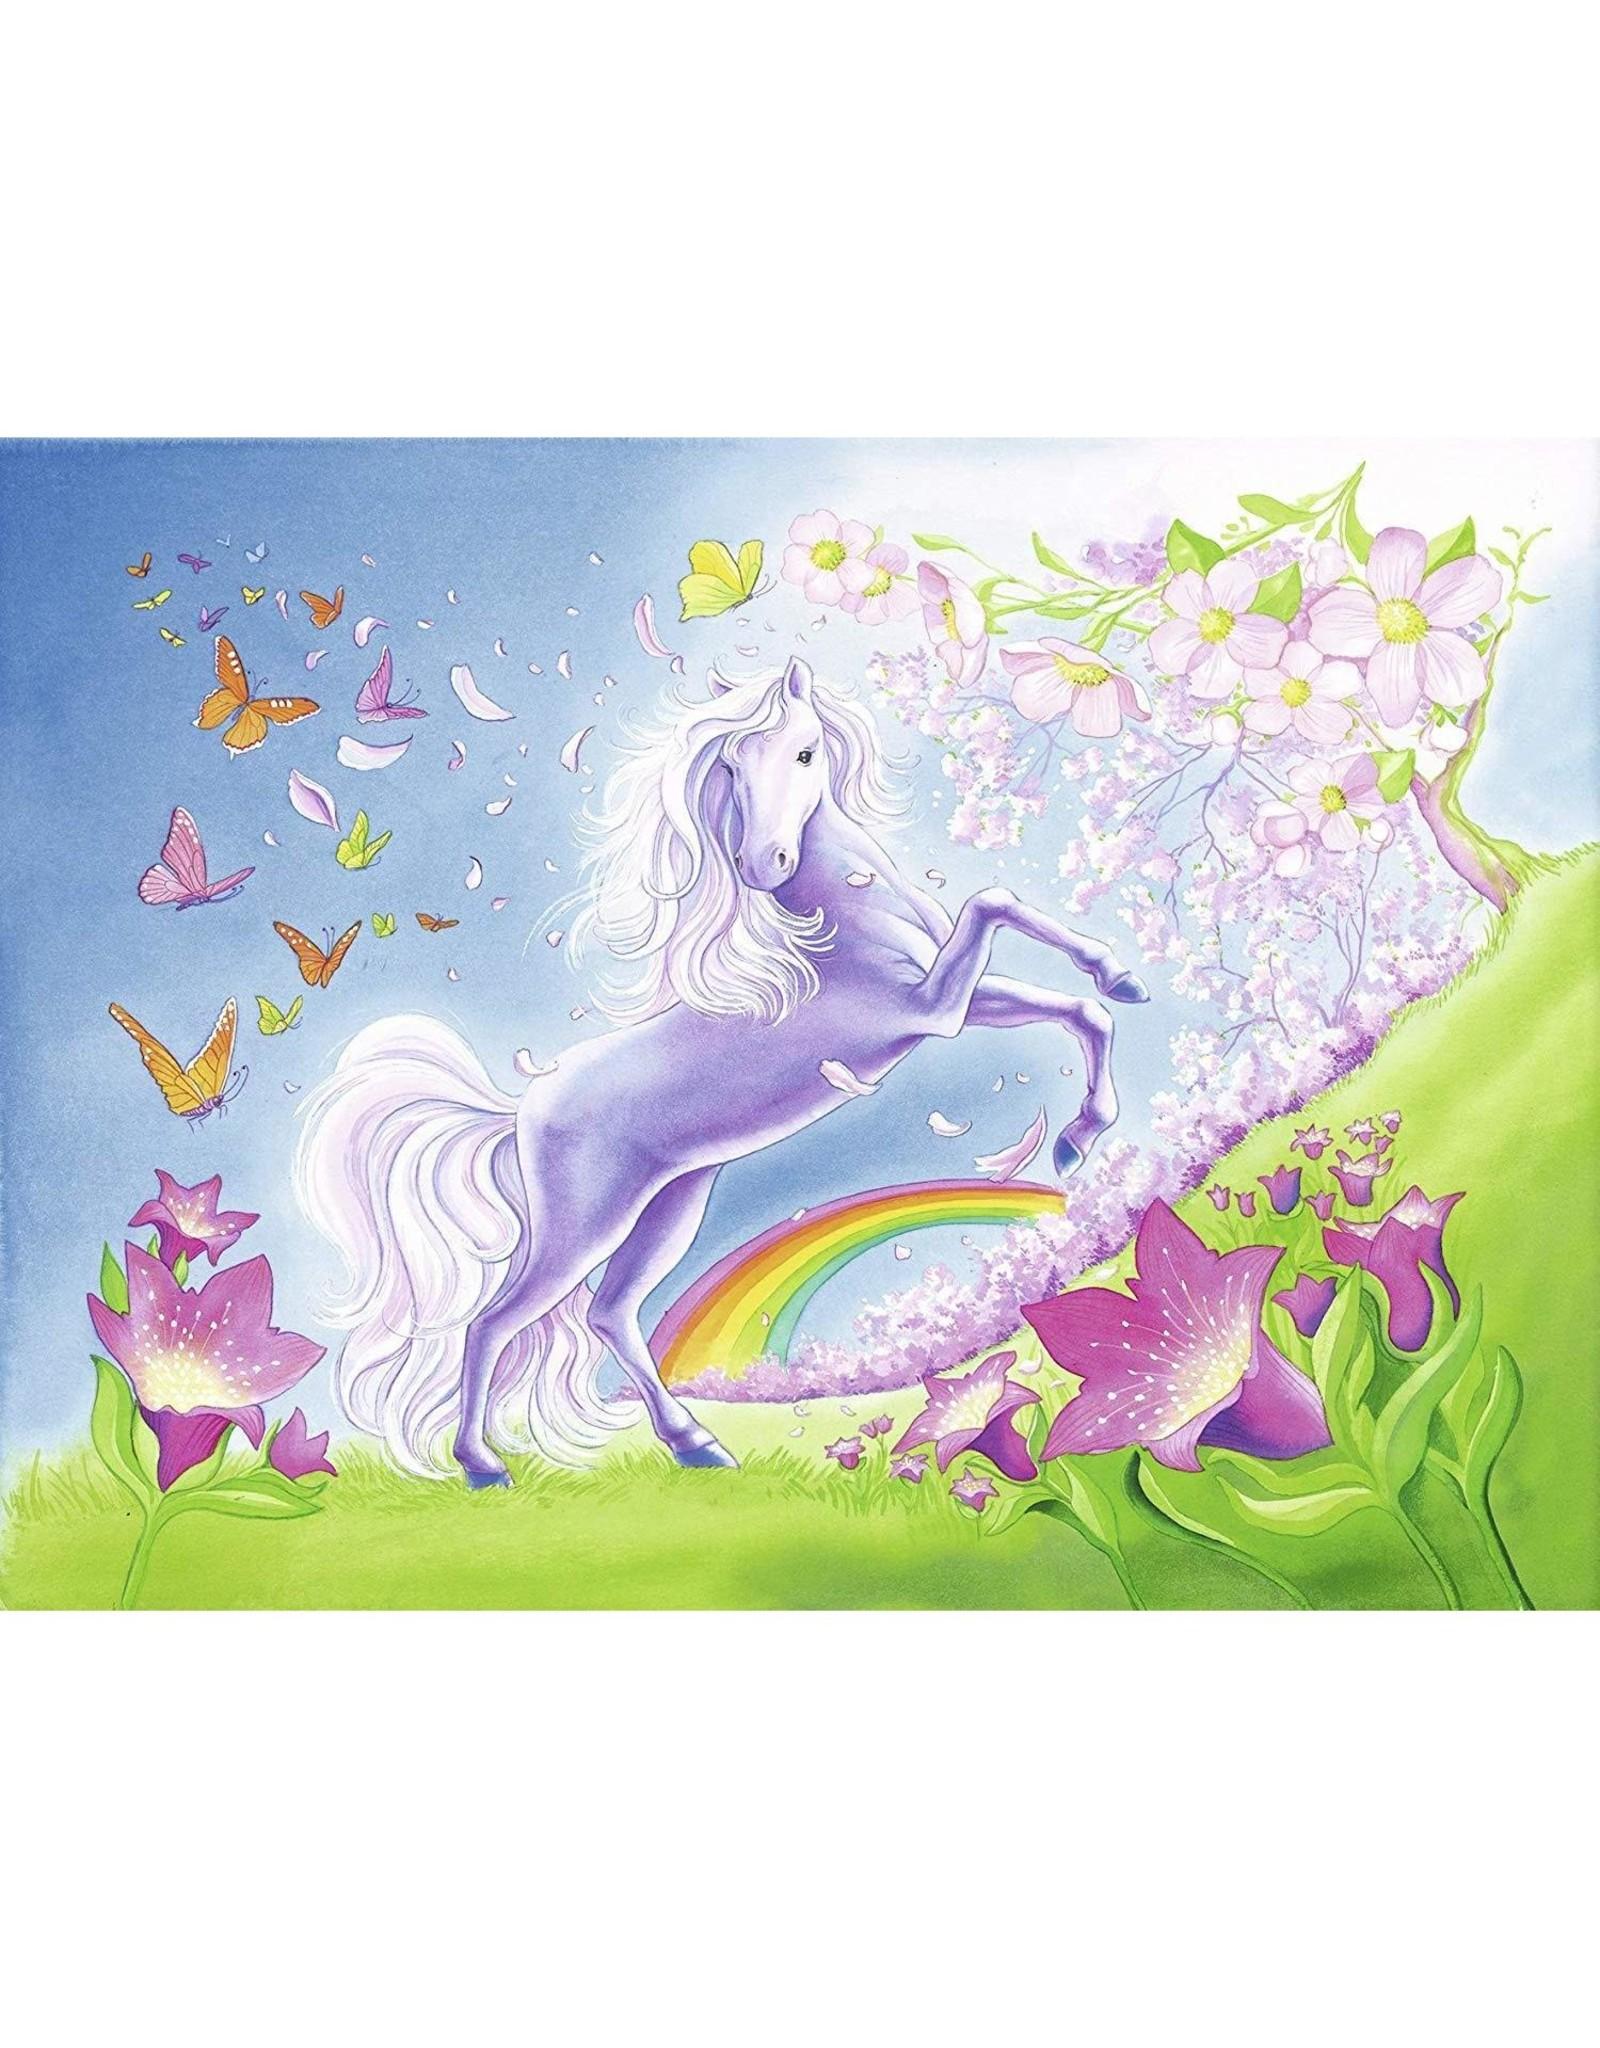 Ravensburger 2x24 pcs. Rainbow Horses Puzzles